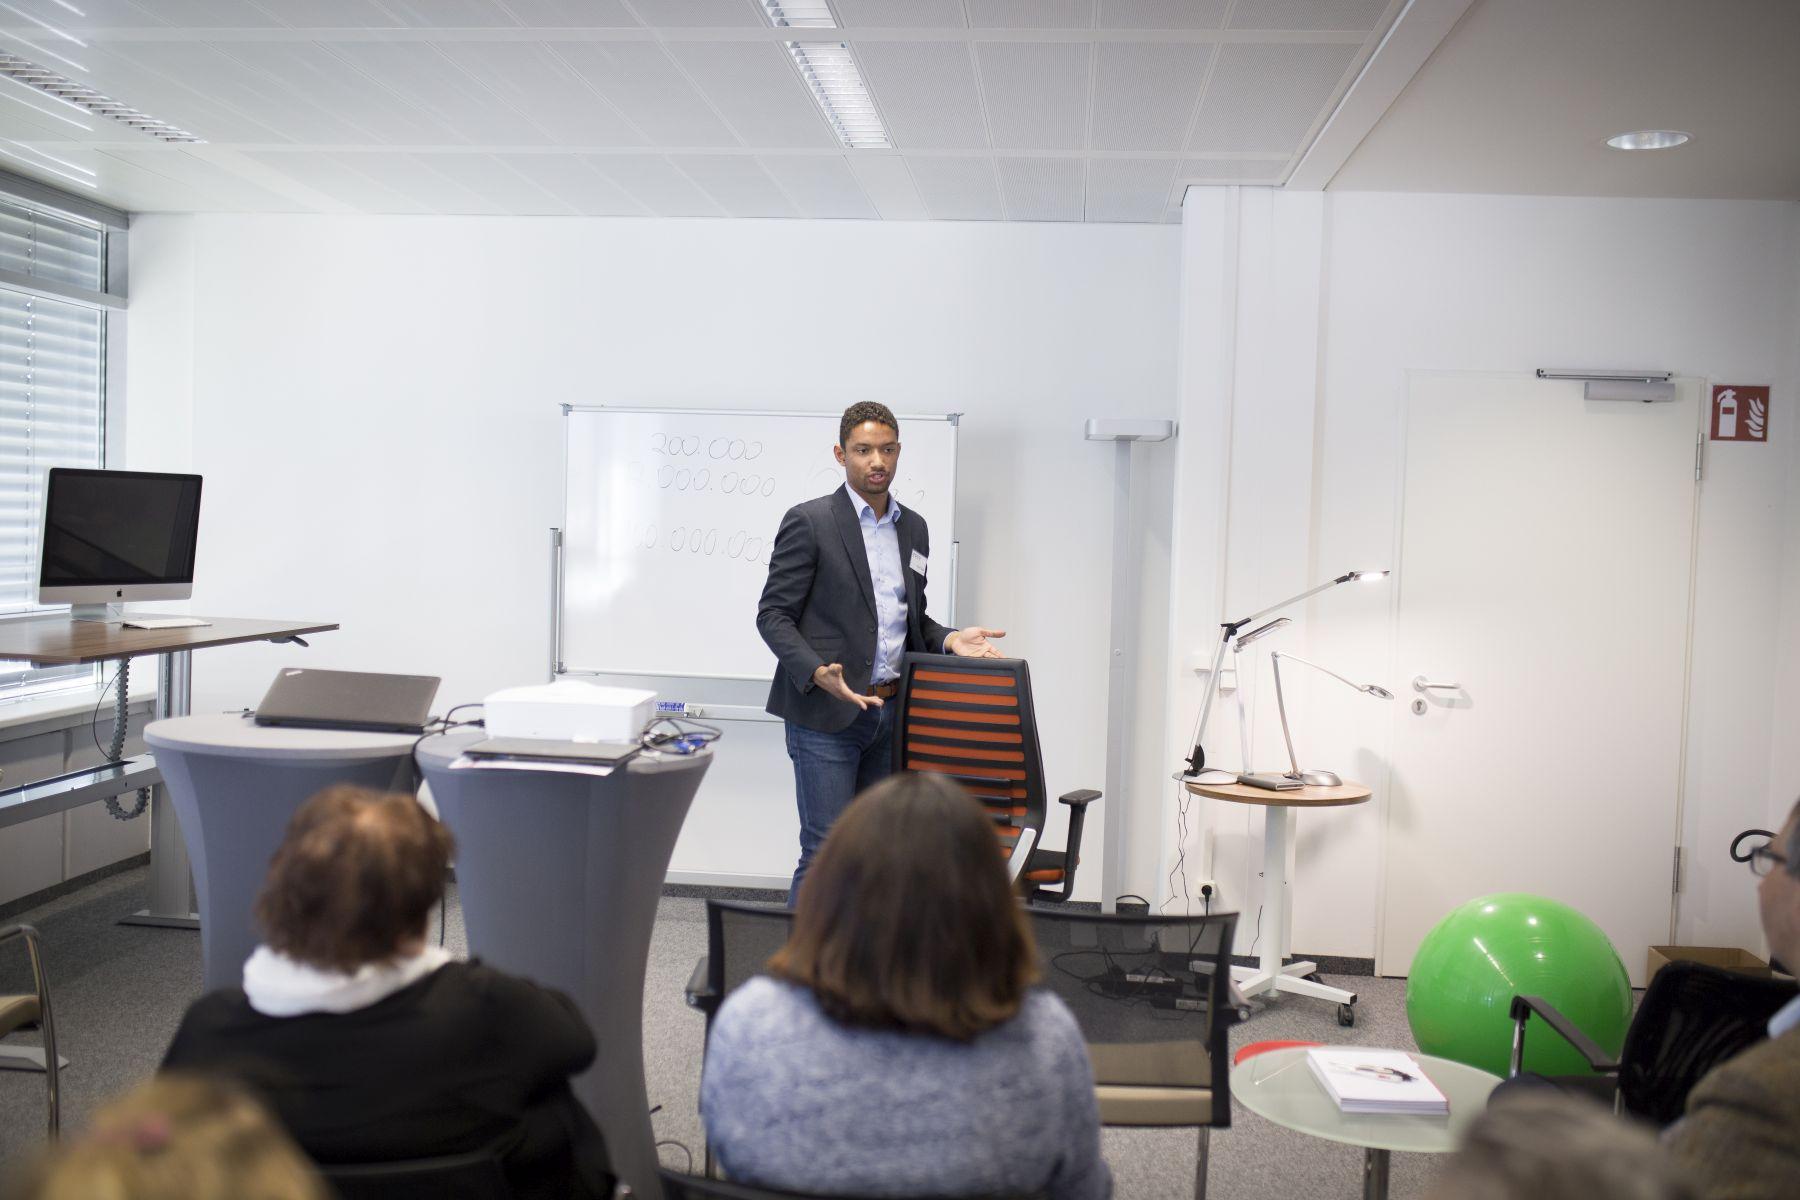 Rückblick: Ergonomie in 5 Punkten - Infoveranstaltung bei Büromöbel-Experte 15